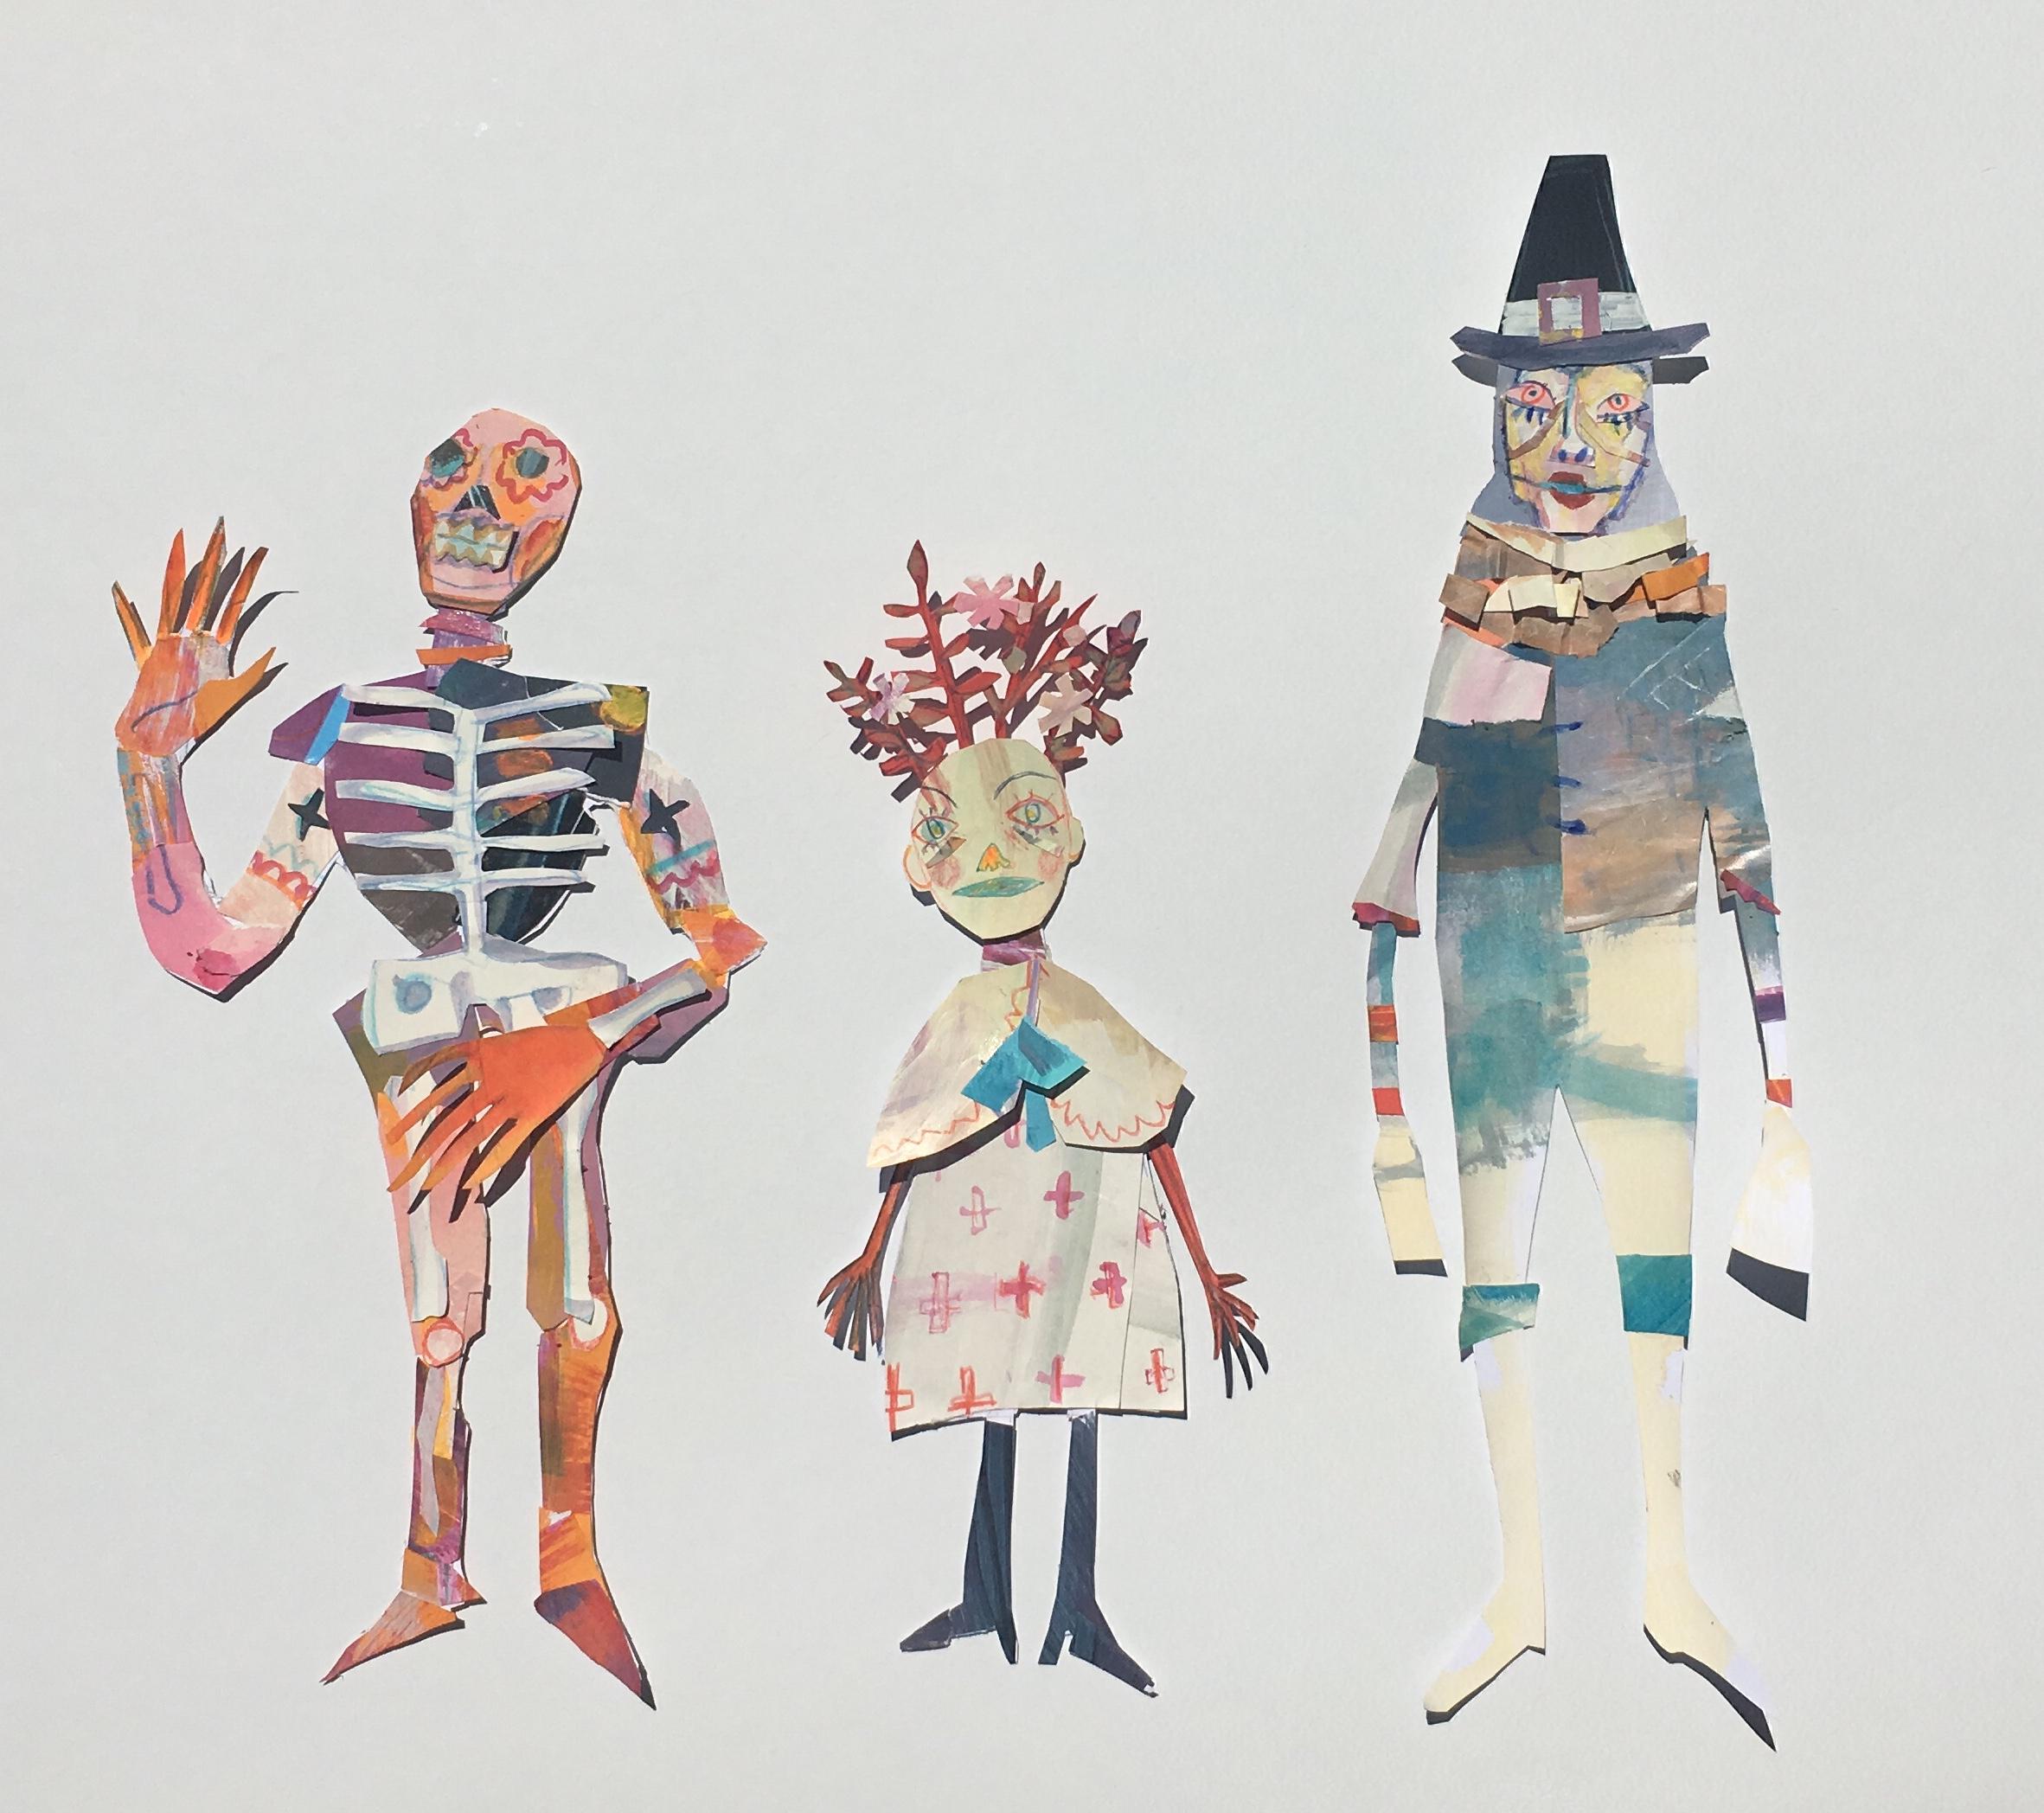 Spooky Guys